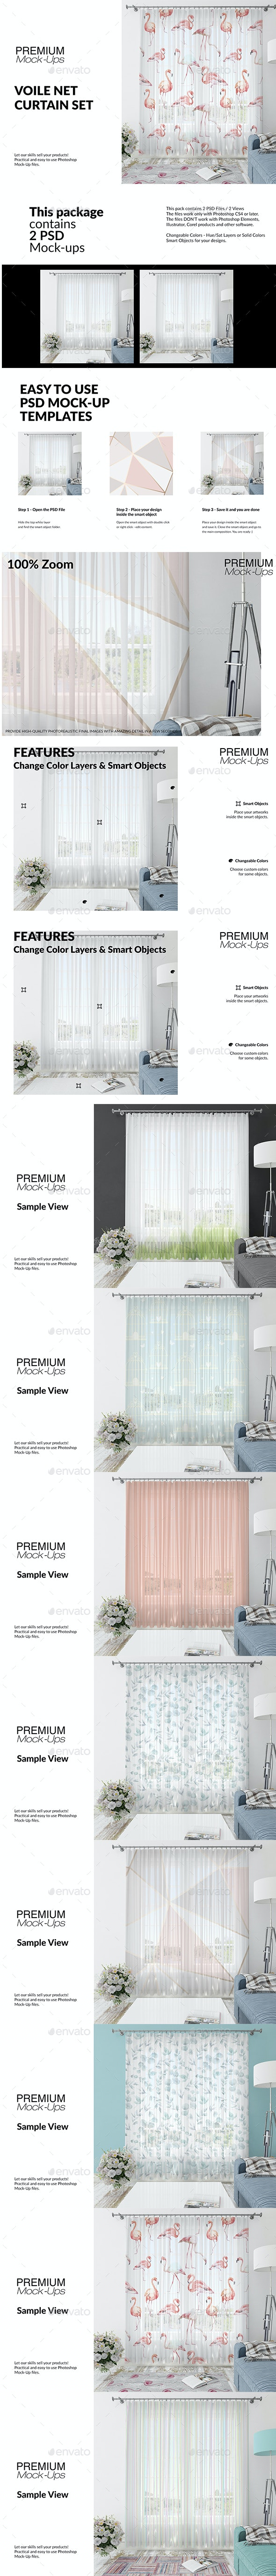 Voile Net Curtain Set - Print Product Mock-Ups